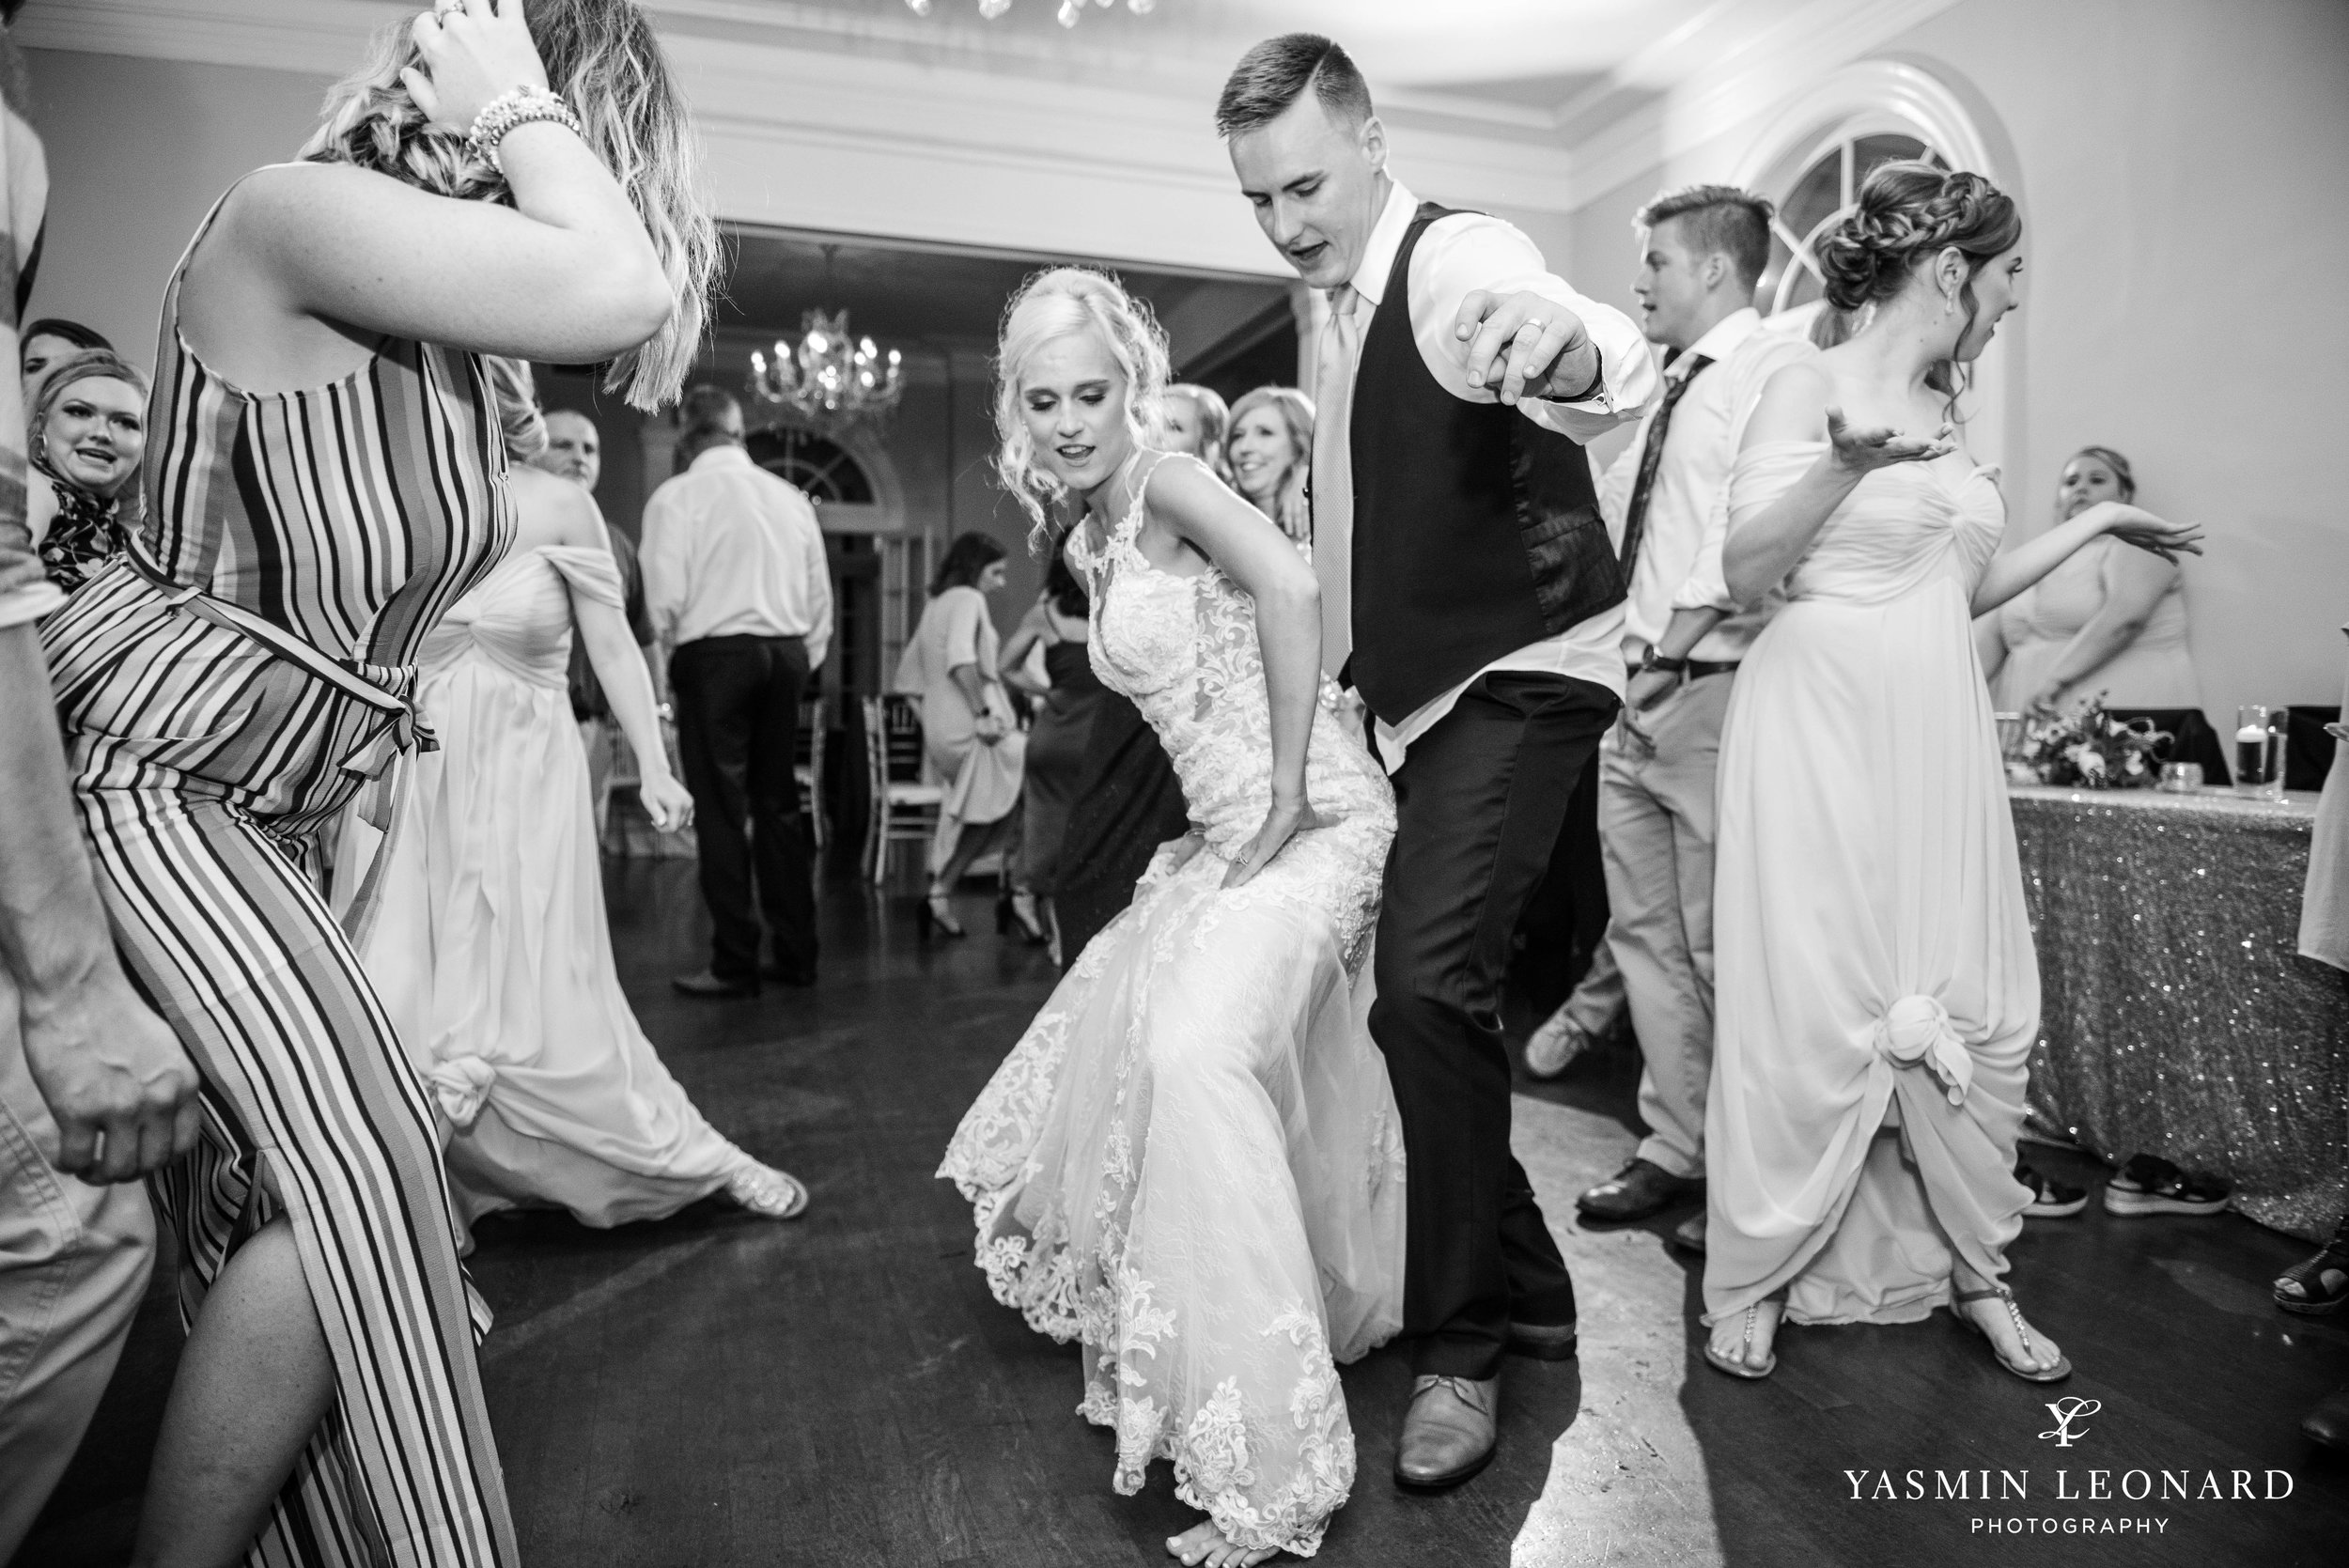 Separk Mansion - NC Weddings - Gastonia Wedding - NC Wedding Venues - Pink and Blue Wedding Ideas - Pink Bridesmaid Dresses - Yasmin Leonard Photography-67.jpg